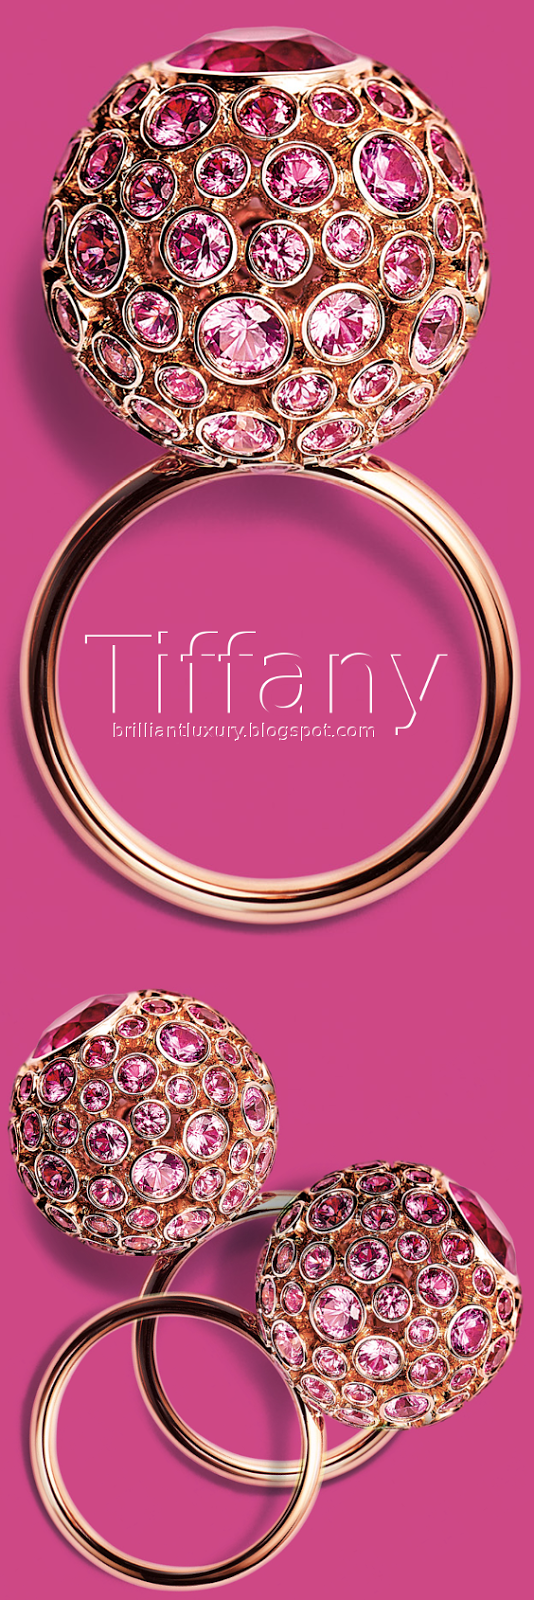 ♢Tiffany High Jewelry | Tiffany, Luxury and Ring